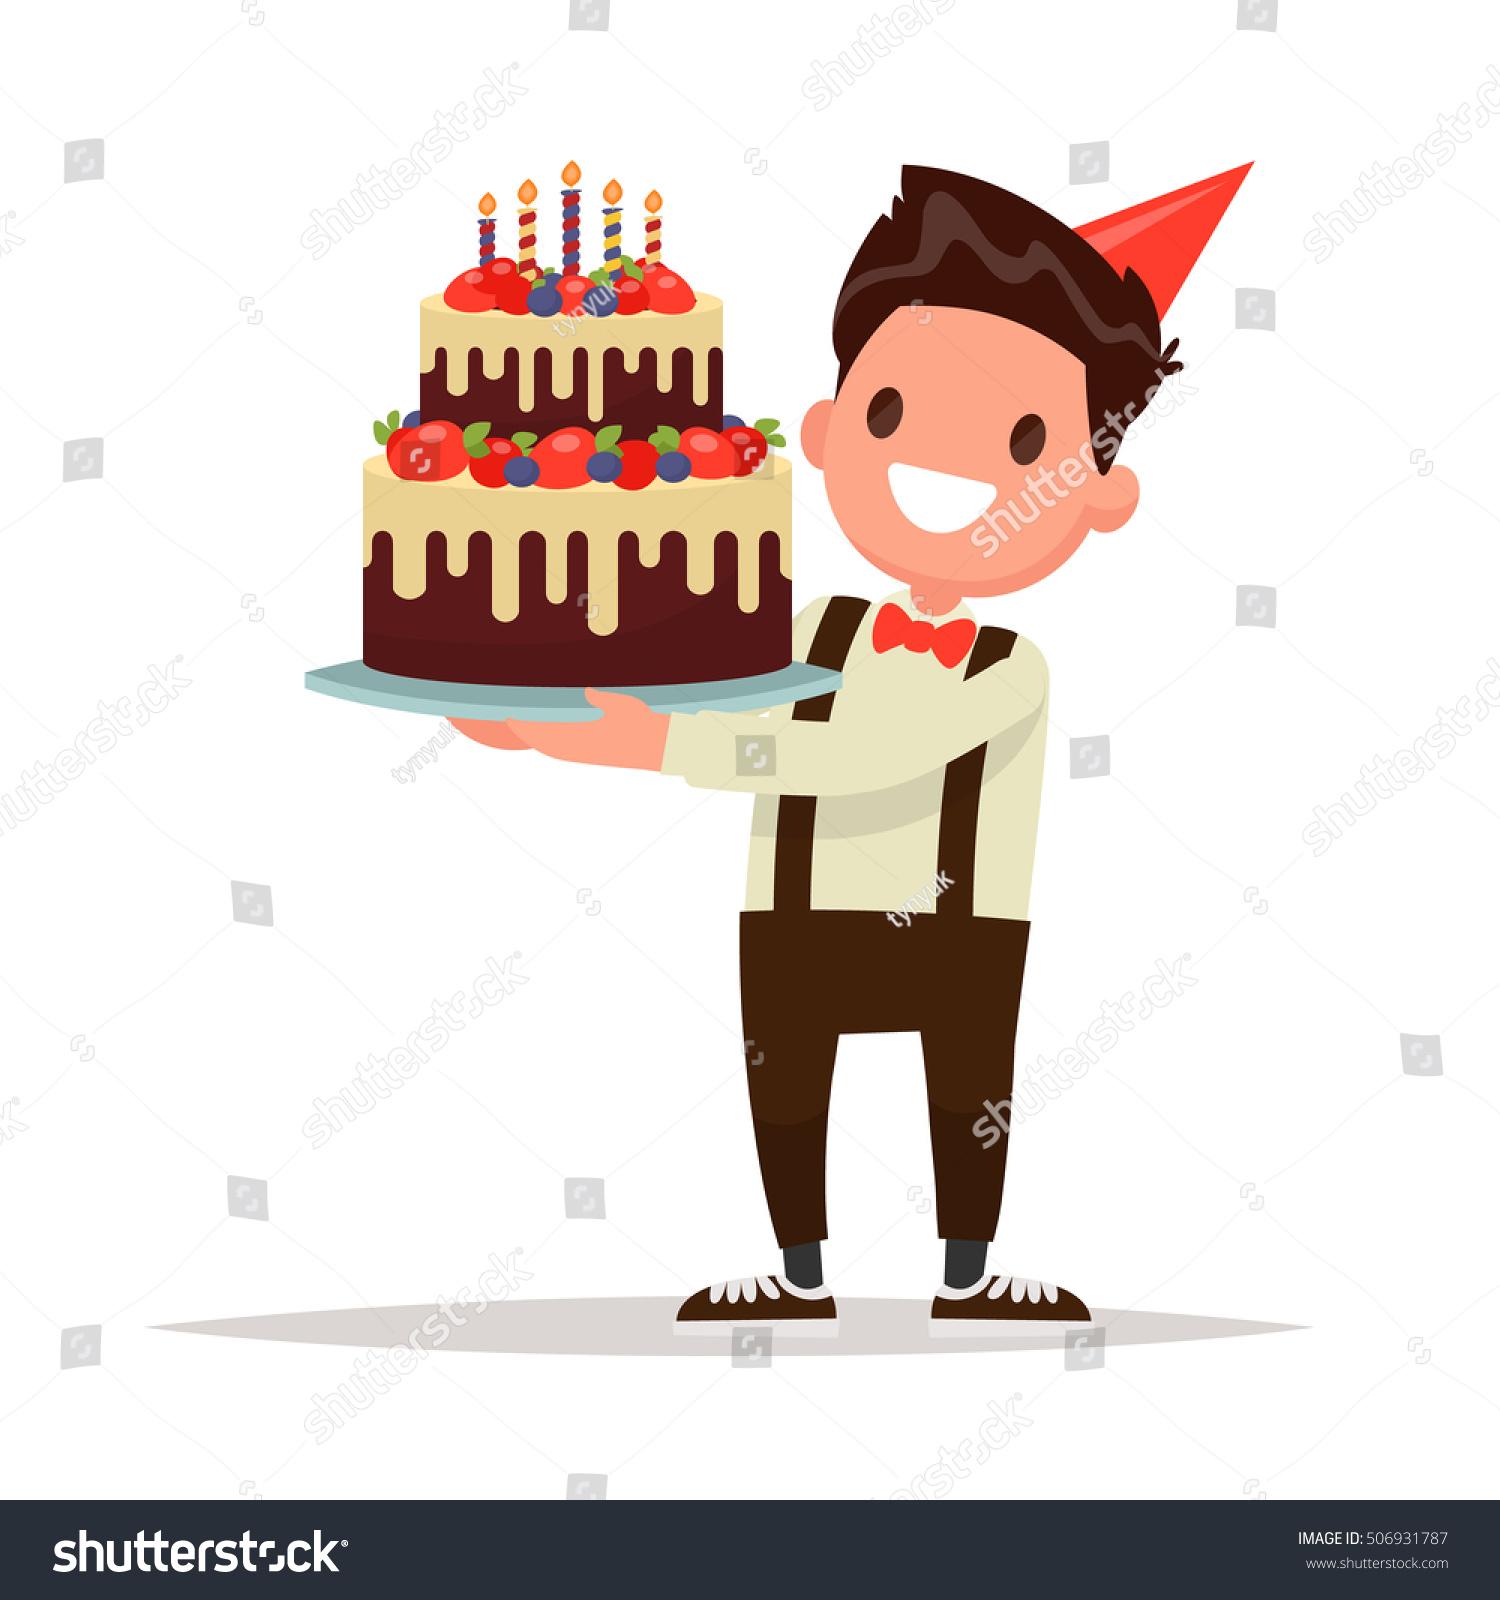 Childrens Birthday Boy Holding Large Cake Stock Vector 506931787